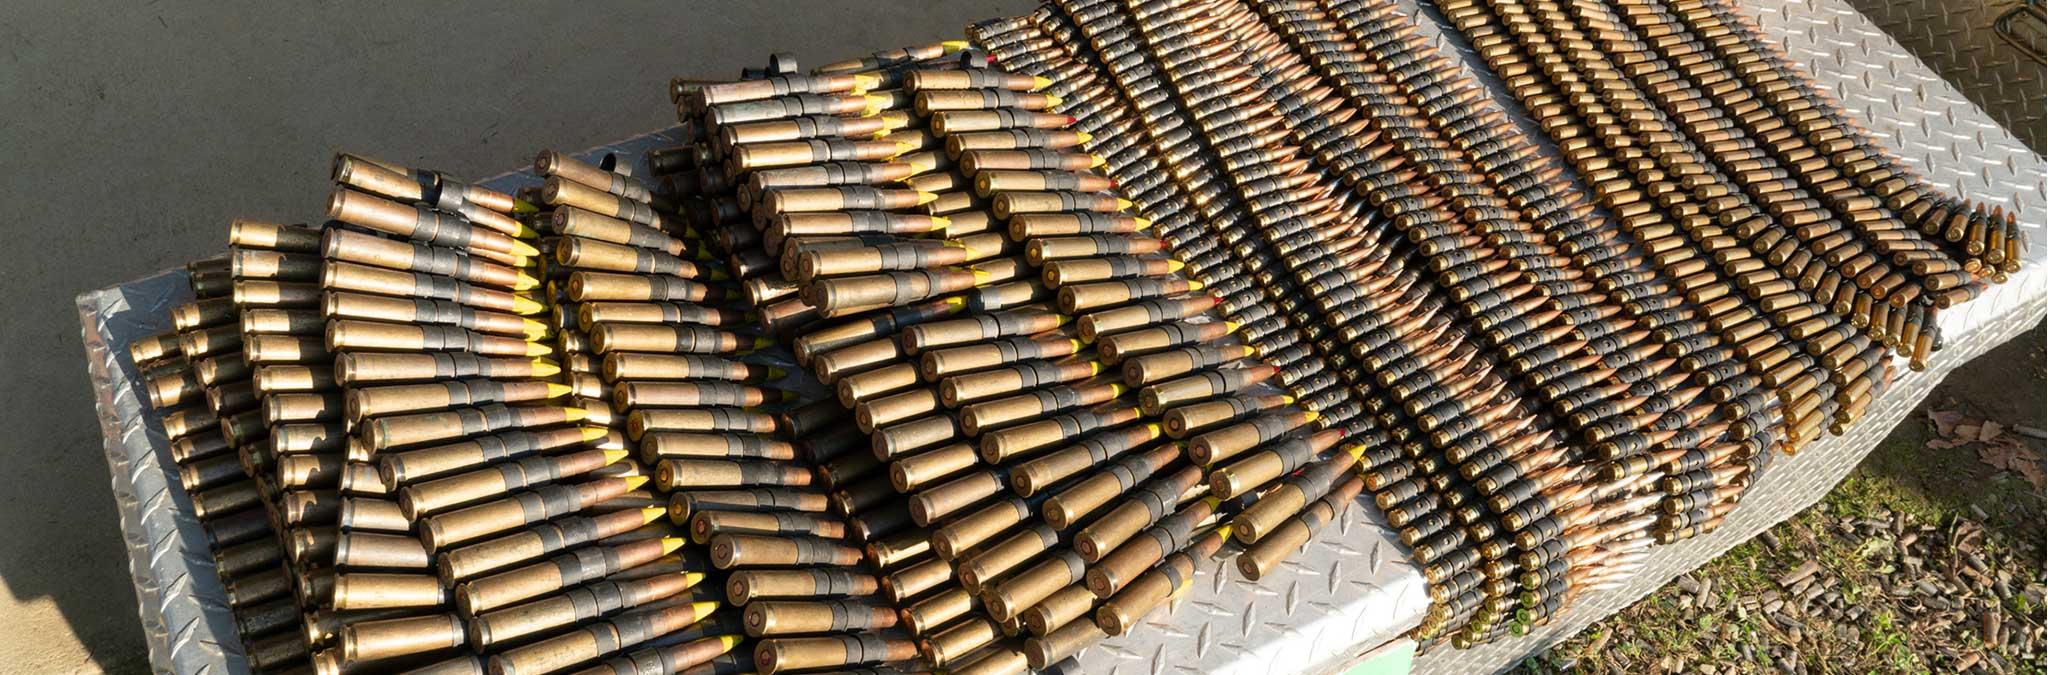 Lifestyle Belt Rifle Ammo Banner